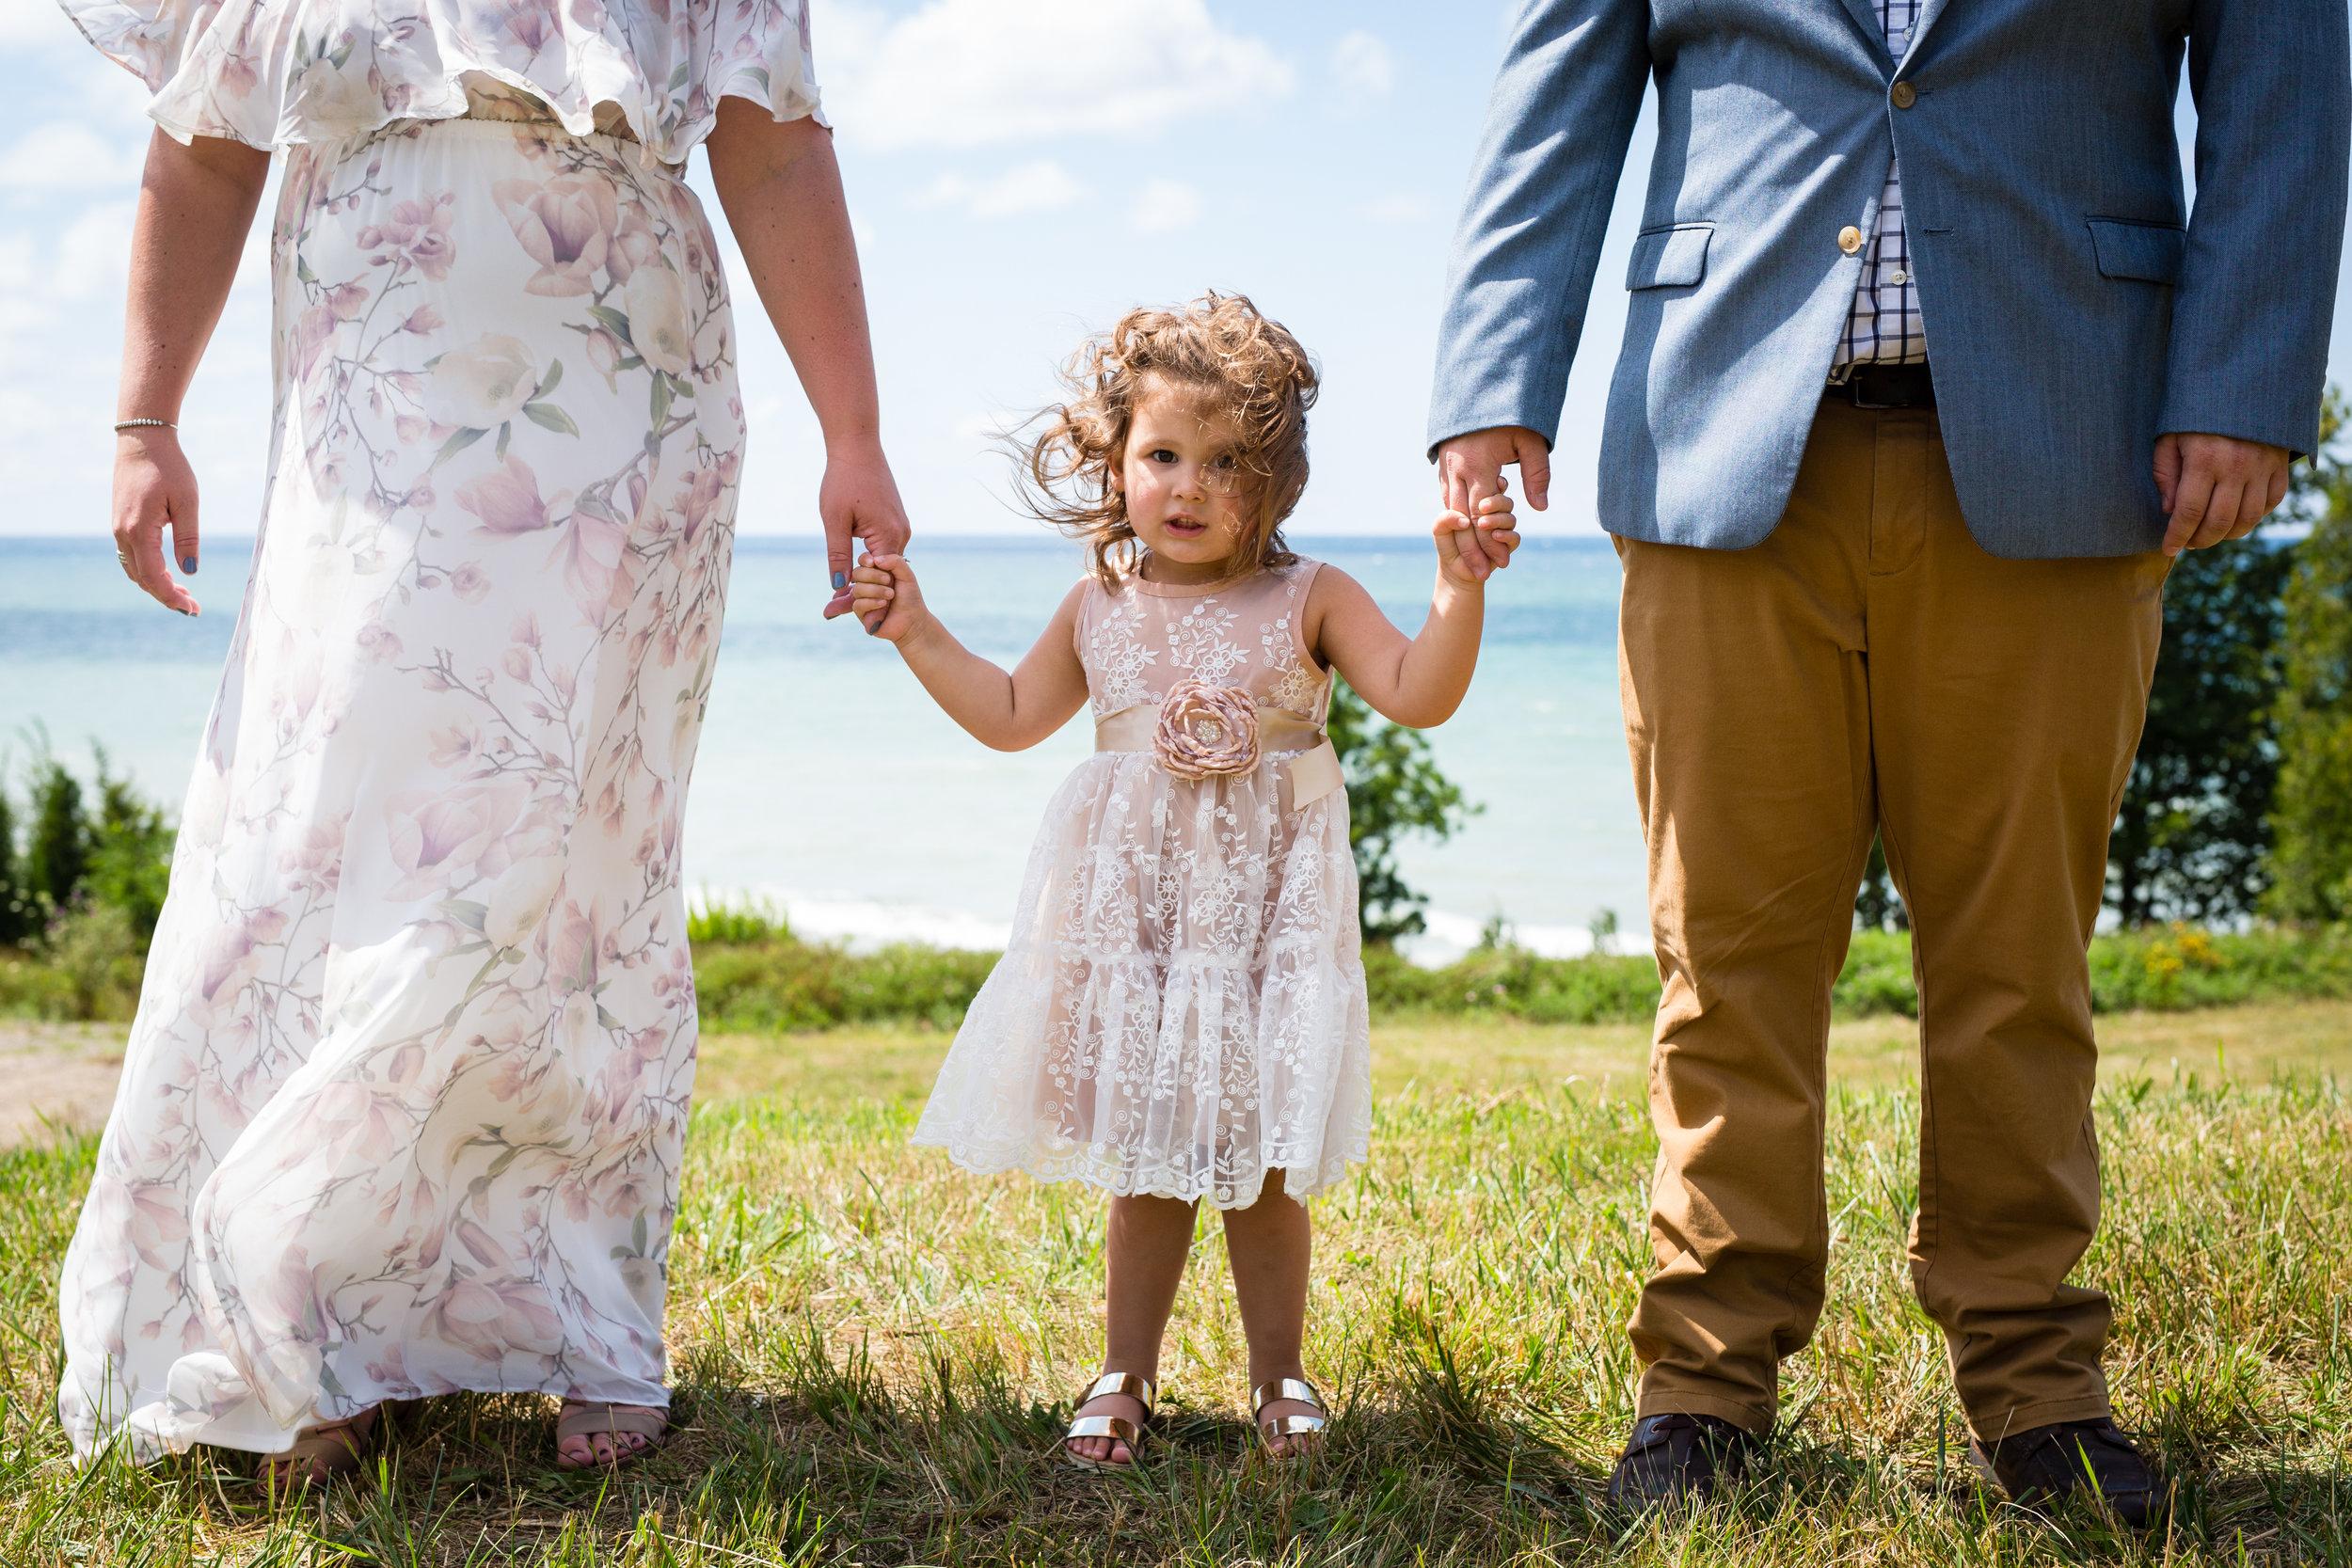 Tim&Polly_Wedding_12CornerVineyard_blog031.JPG